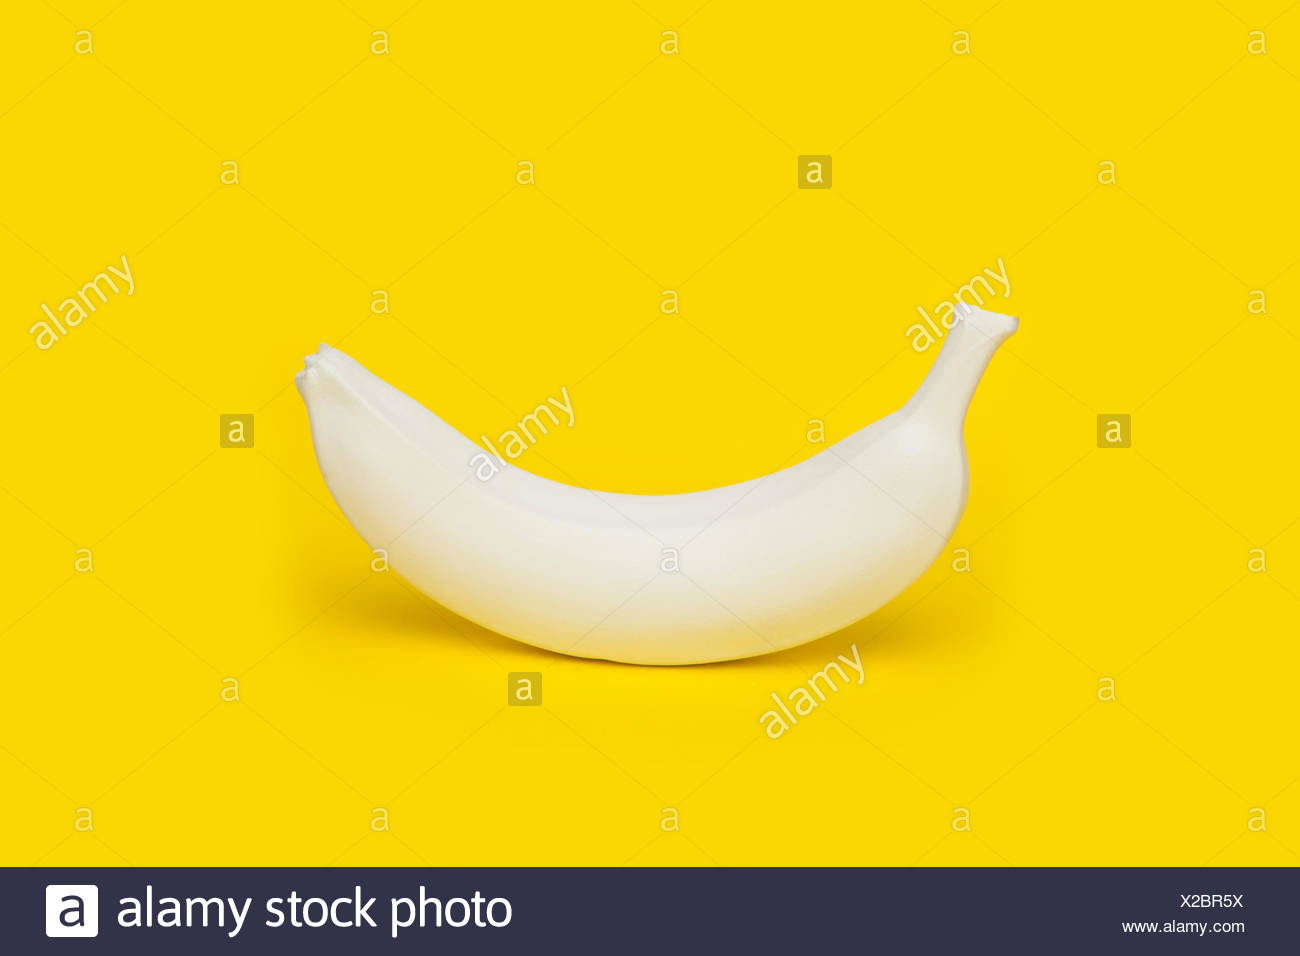 Banana peint en blanc sur fond jaune Photo Stock